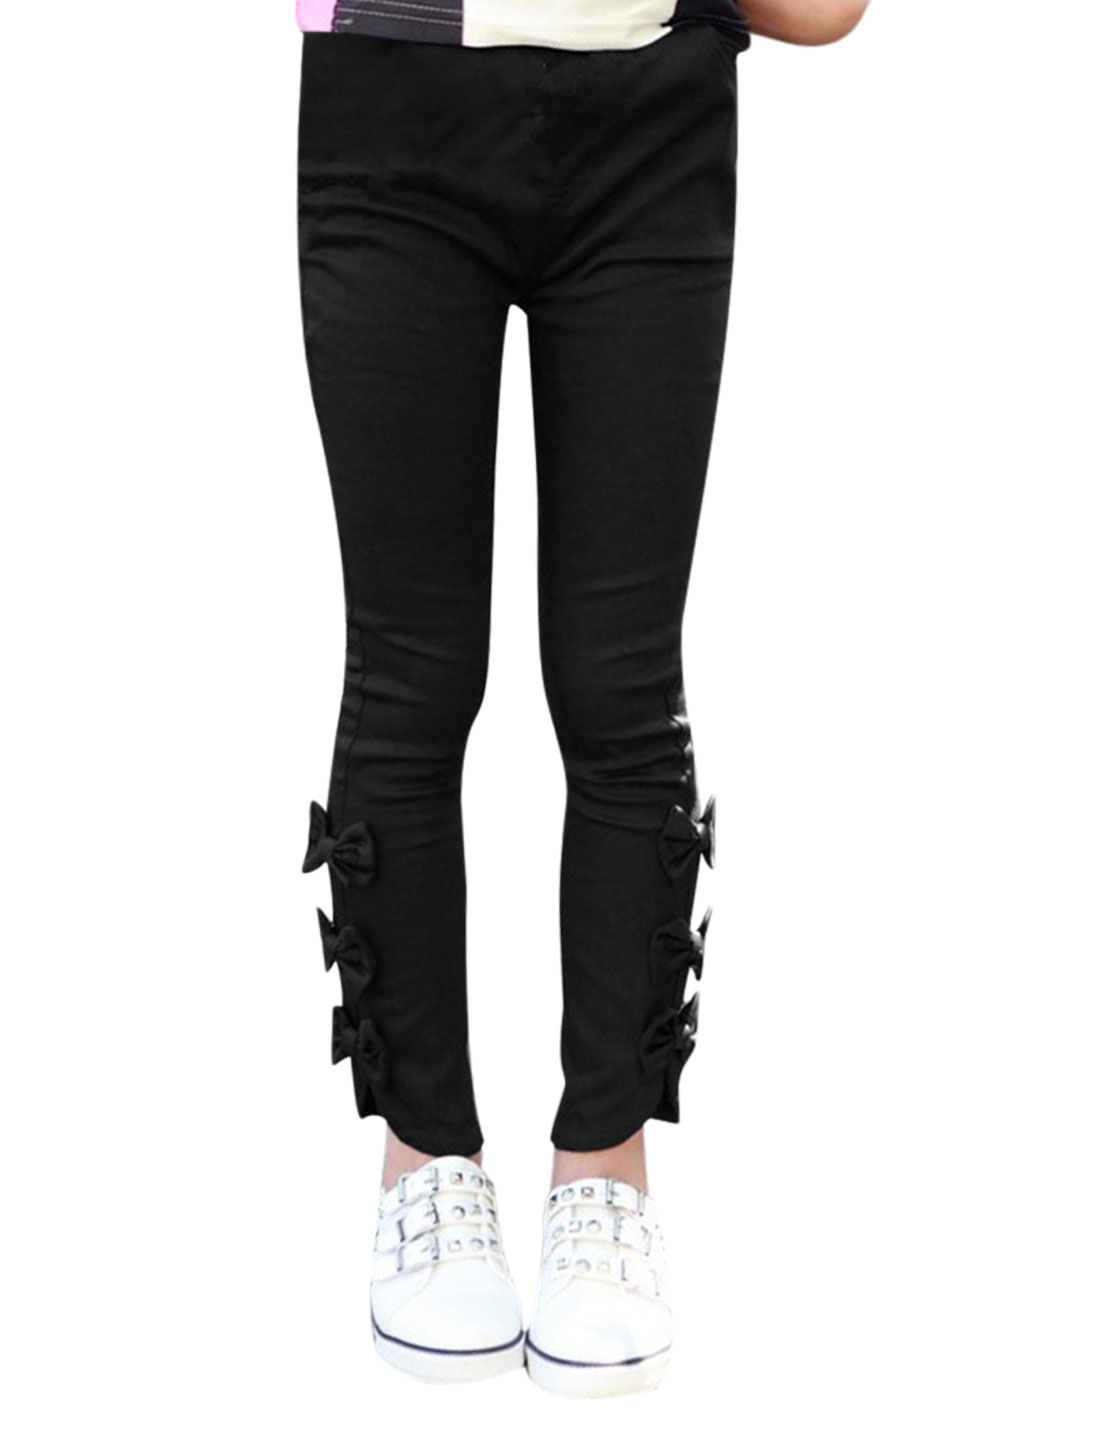 Girls Front Pockets Slim Fit Bowknot Trousers Allegra Kids Black 6